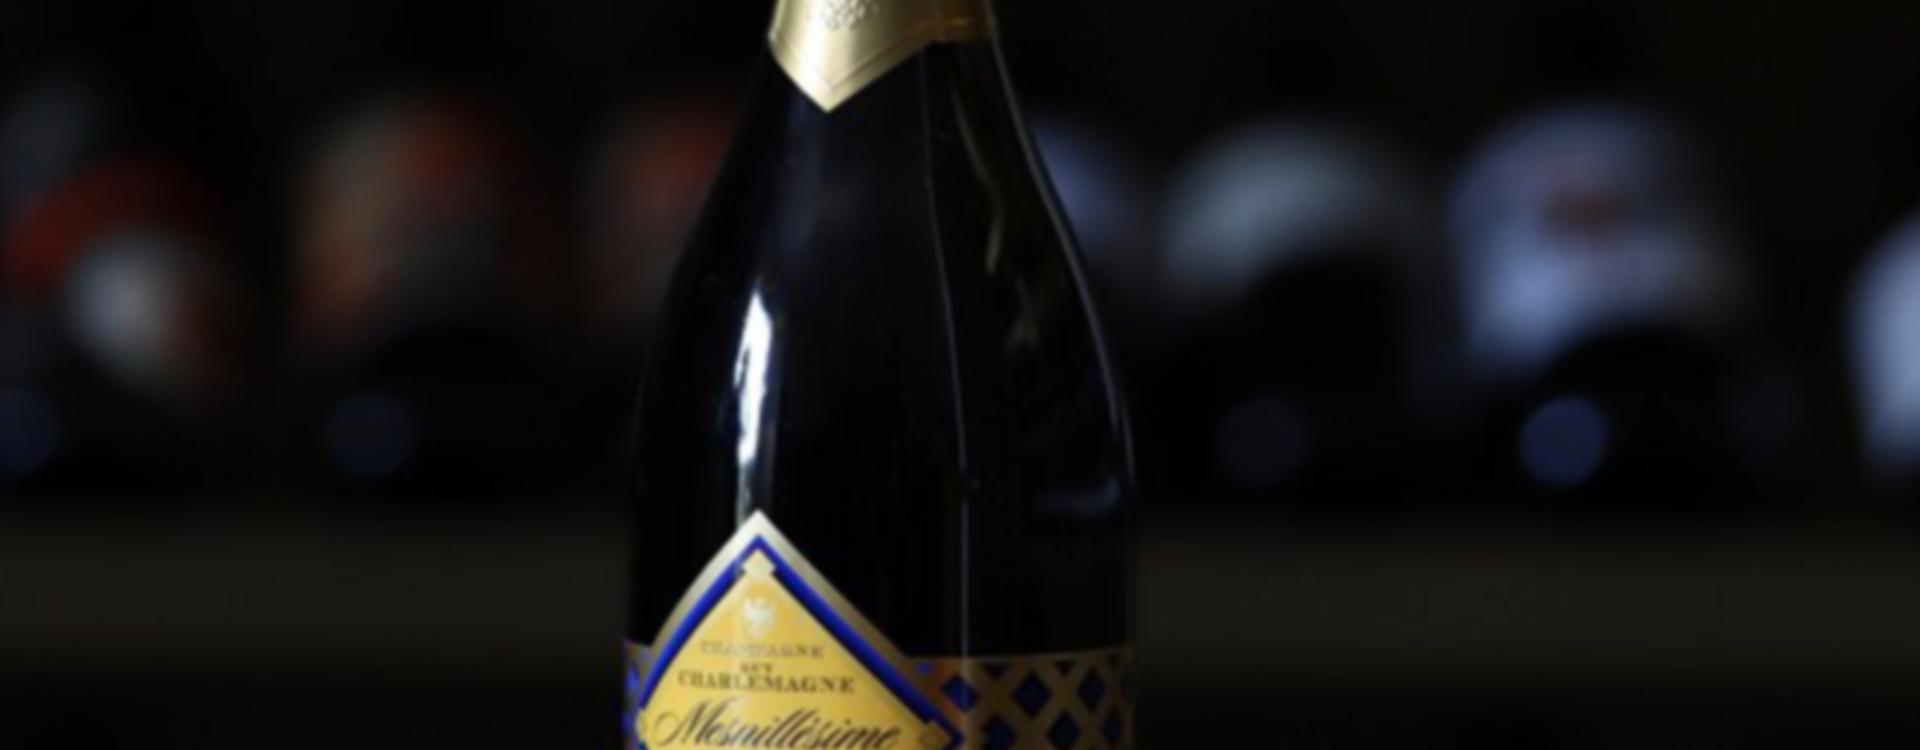 Guy Charlemagne Champagne